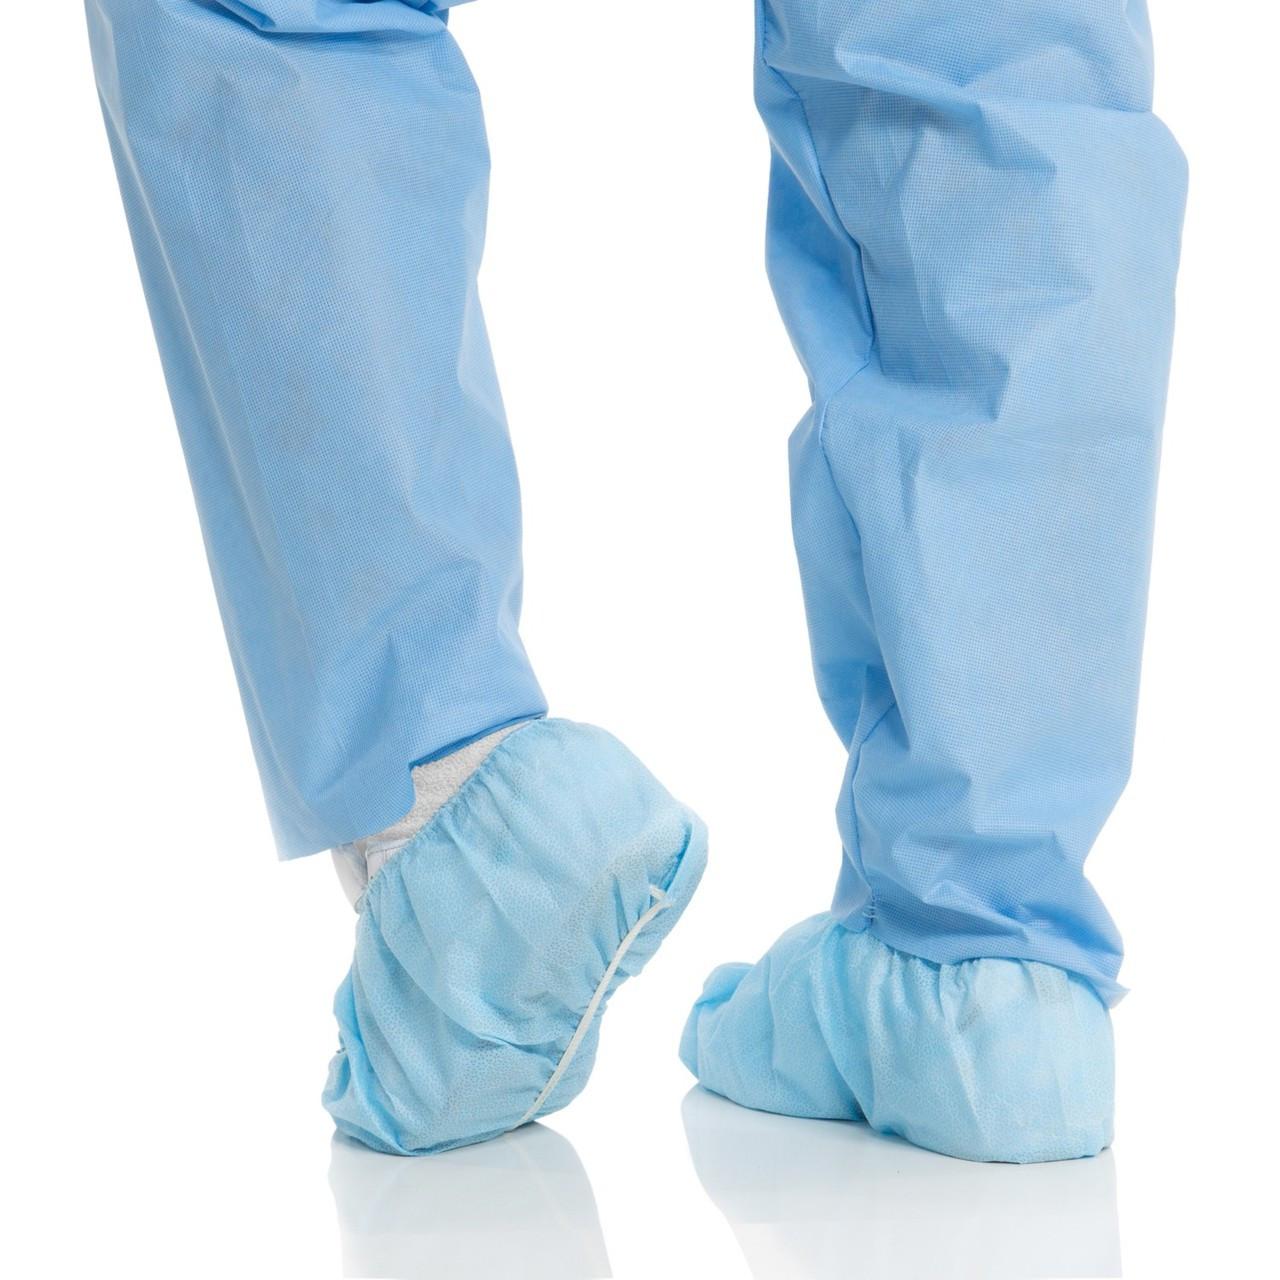 Medical Shoe Covers Heavy Duty